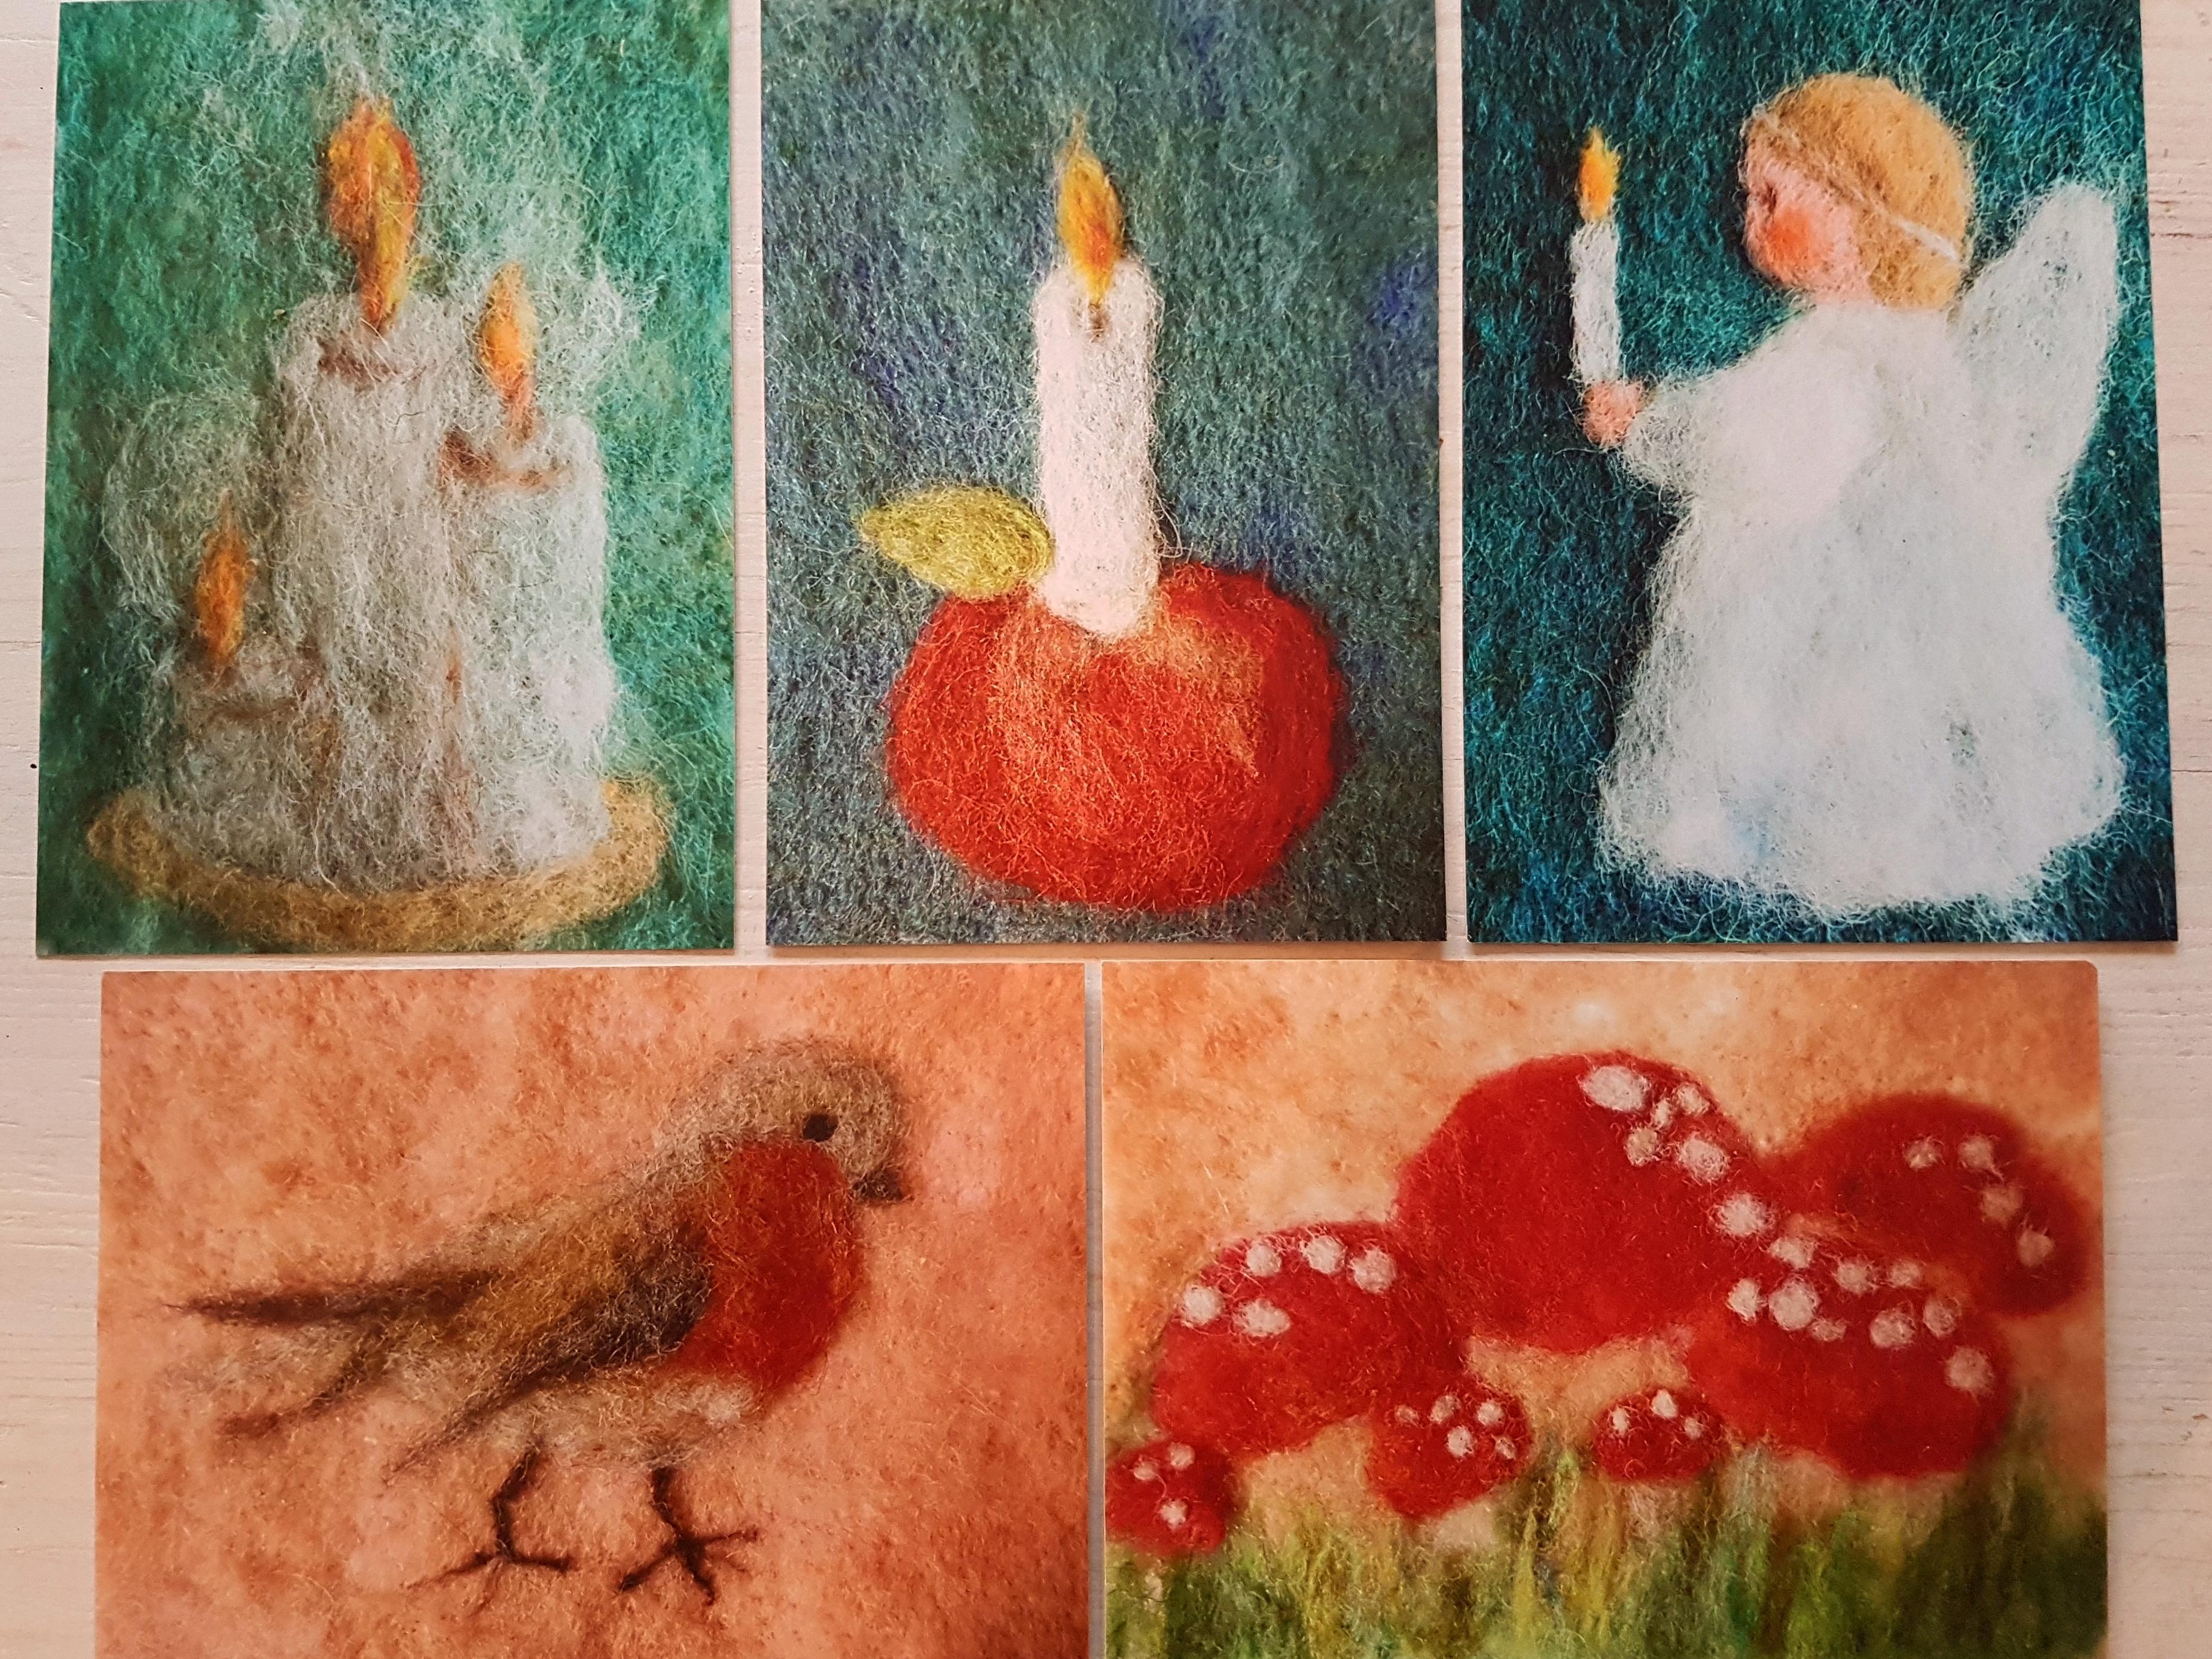 07_Pien_WS_Evinghausen_5Postkarten